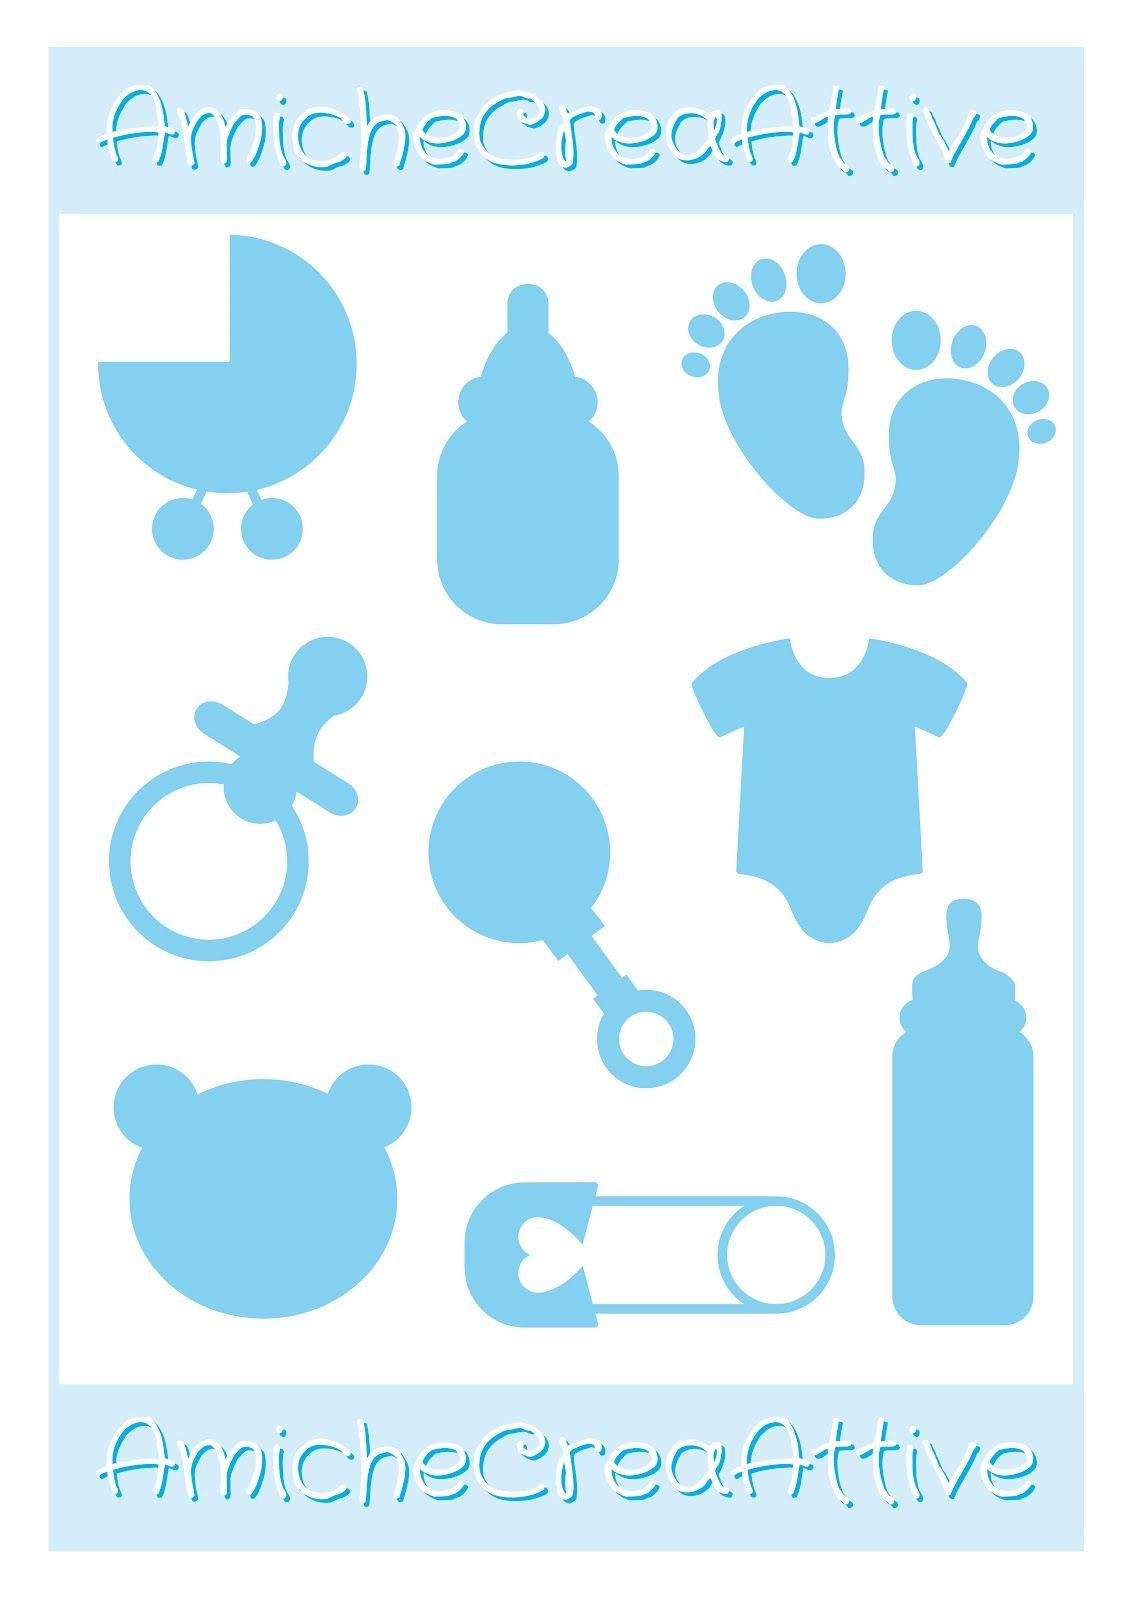 baby boy printables - AmicheCreaAttive | Printables | Pinterest ...